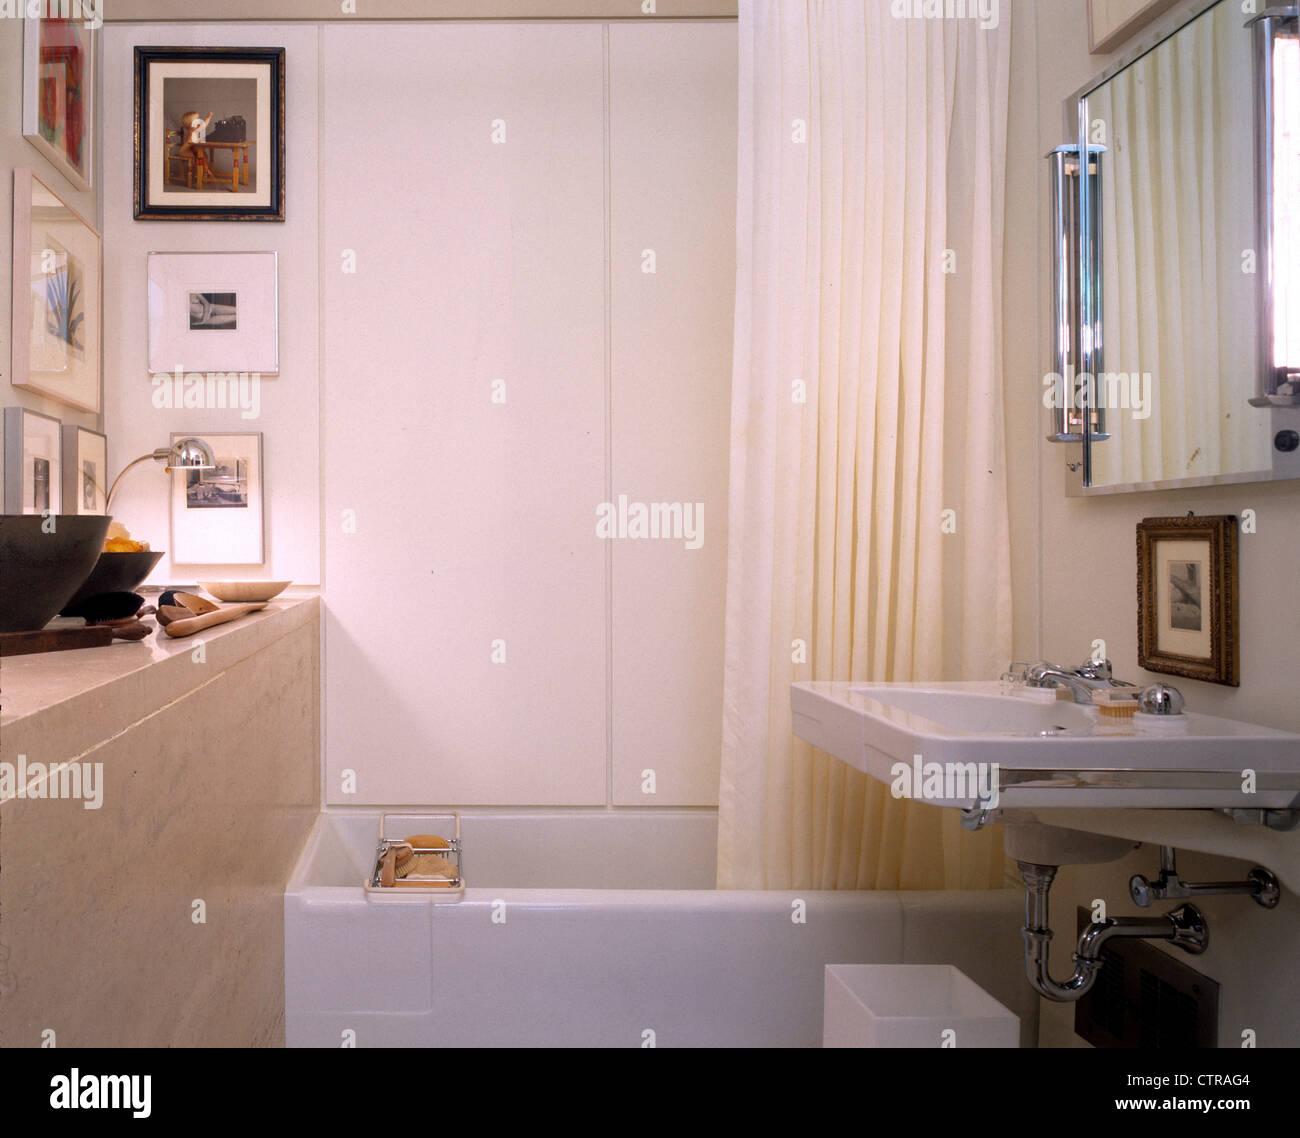 farnsworth house bathroom stock photo royalty free image